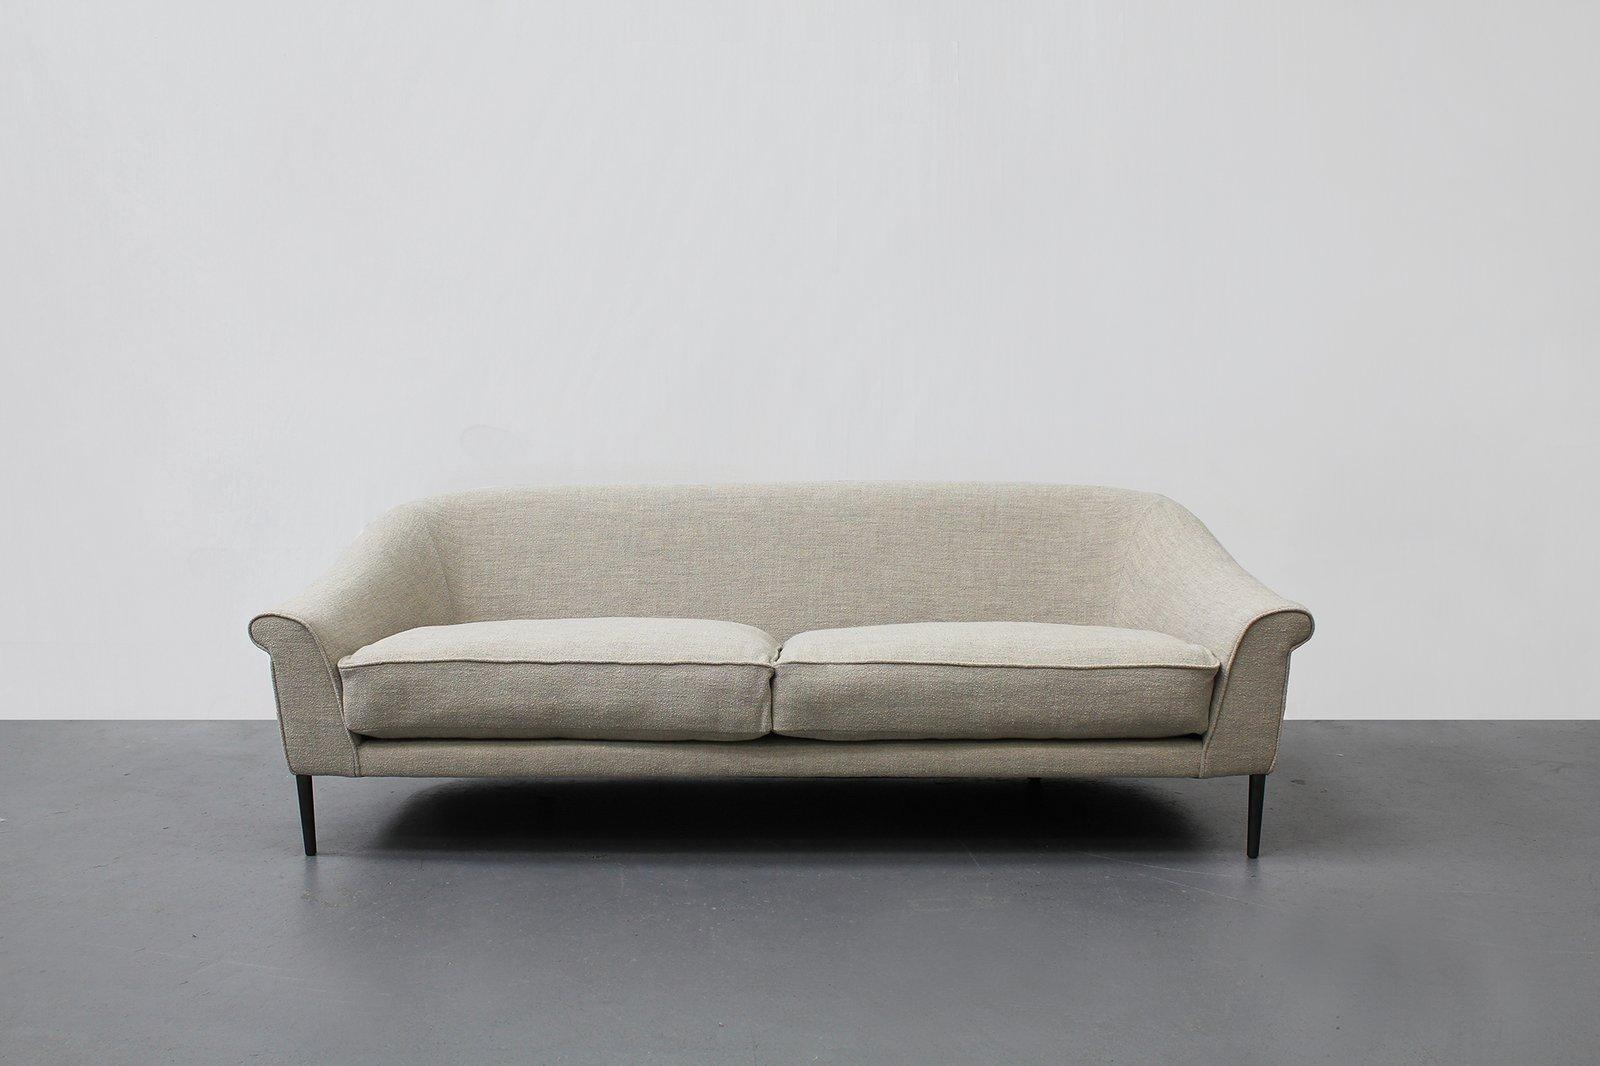 #seatingdesign #couch #SCP #British #furniture #solsticesofa #MatthewHilton #modern #minimalist  100+ Best Modern Seating Designs by Dwell